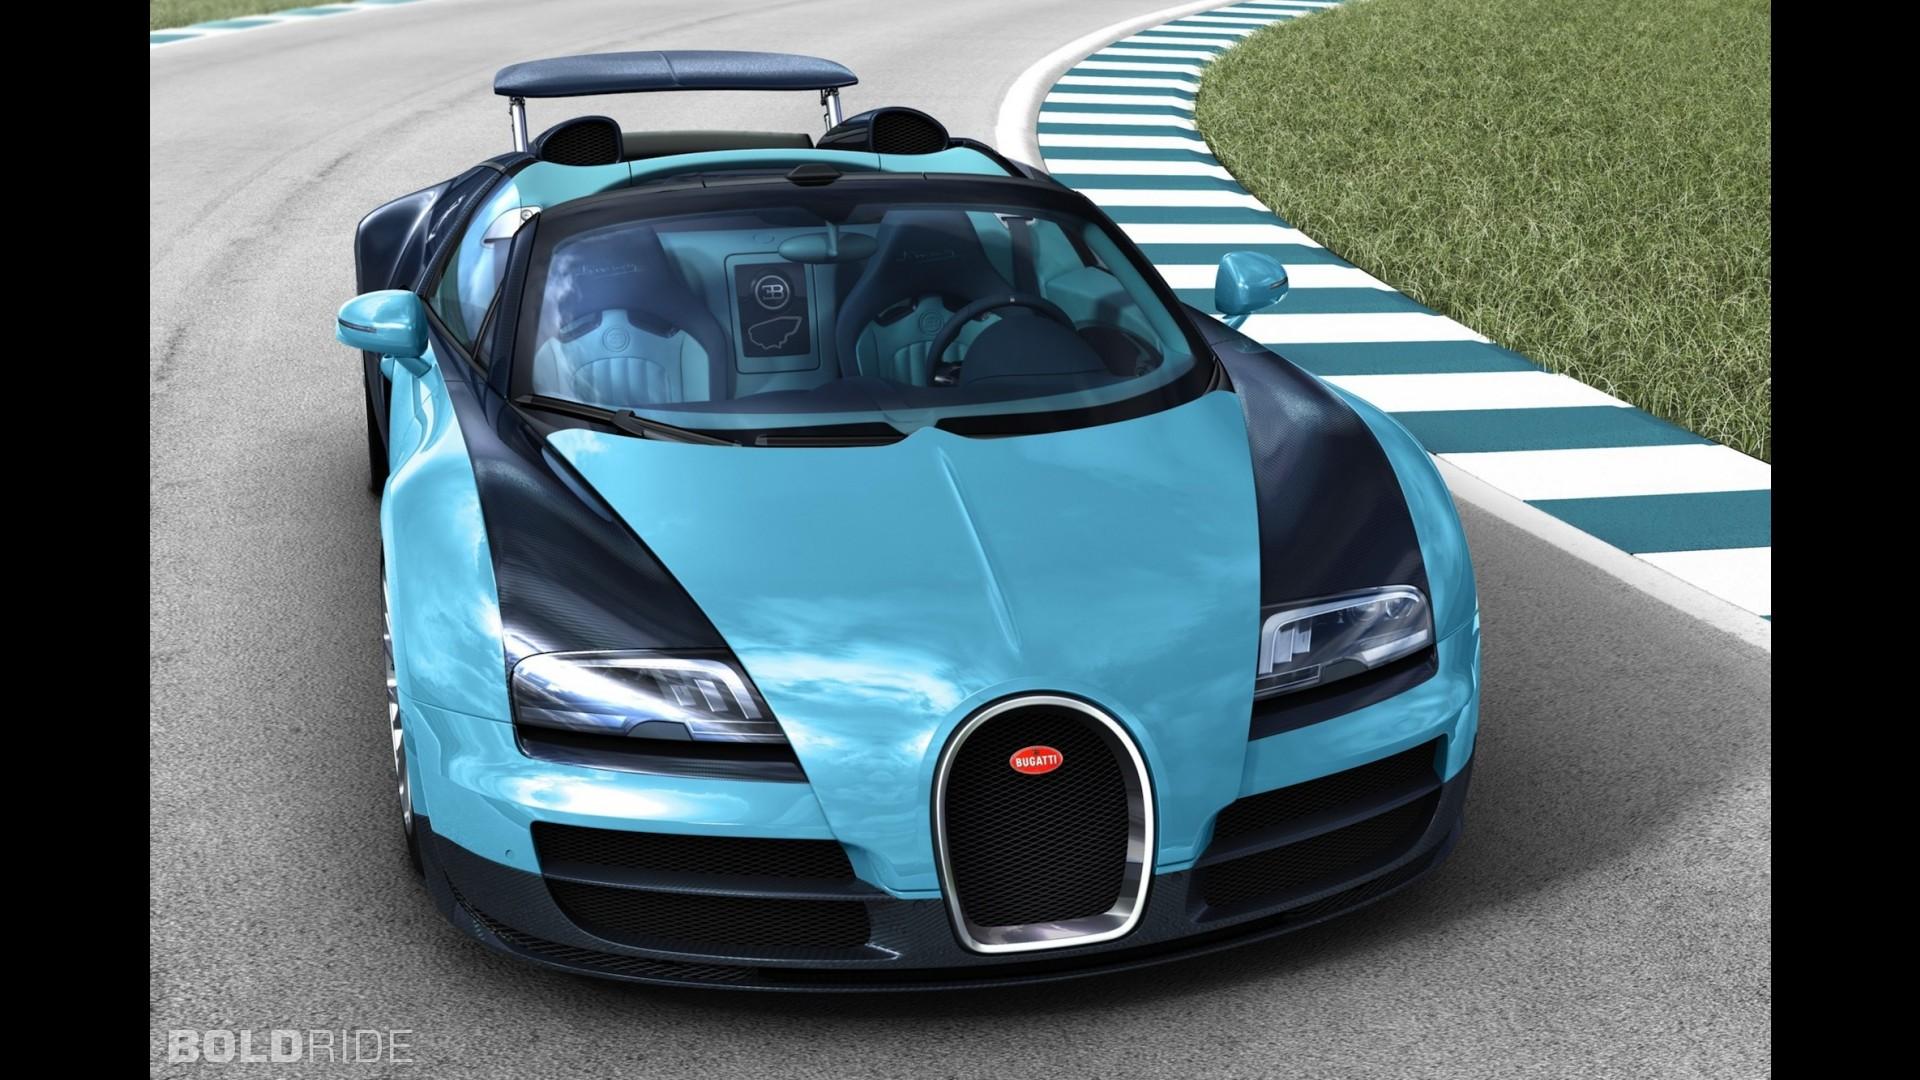 astounding bugatti veyron grand sport vitesse km h noisiestpassenger. Black Bedroom Furniture Sets. Home Design Ideas